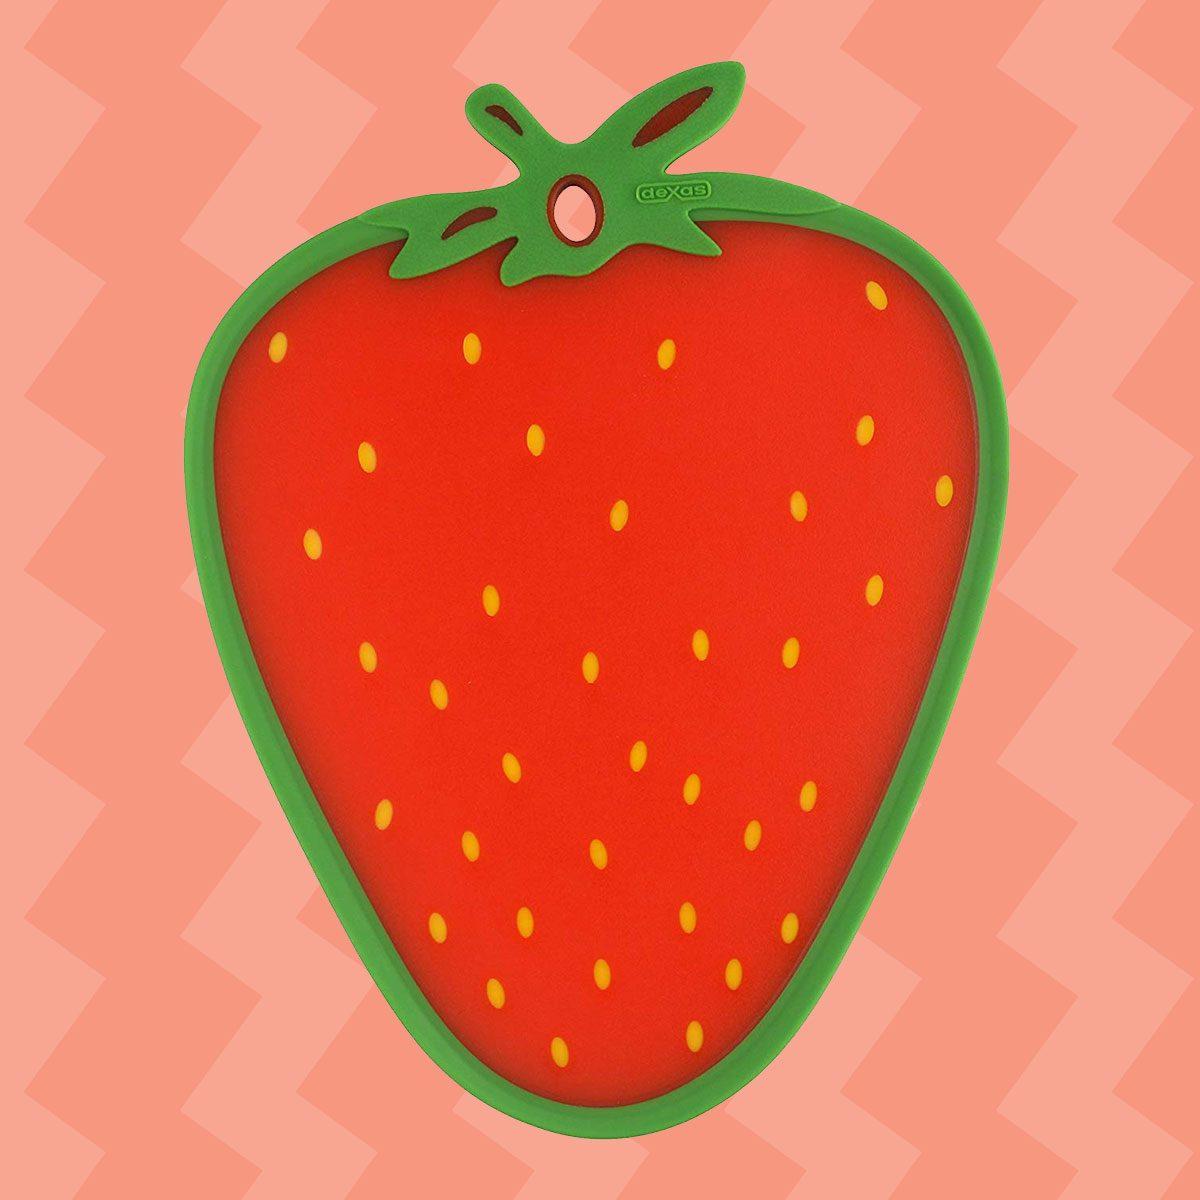 Dexas Cutting/Serving Board, Strawberry Shape